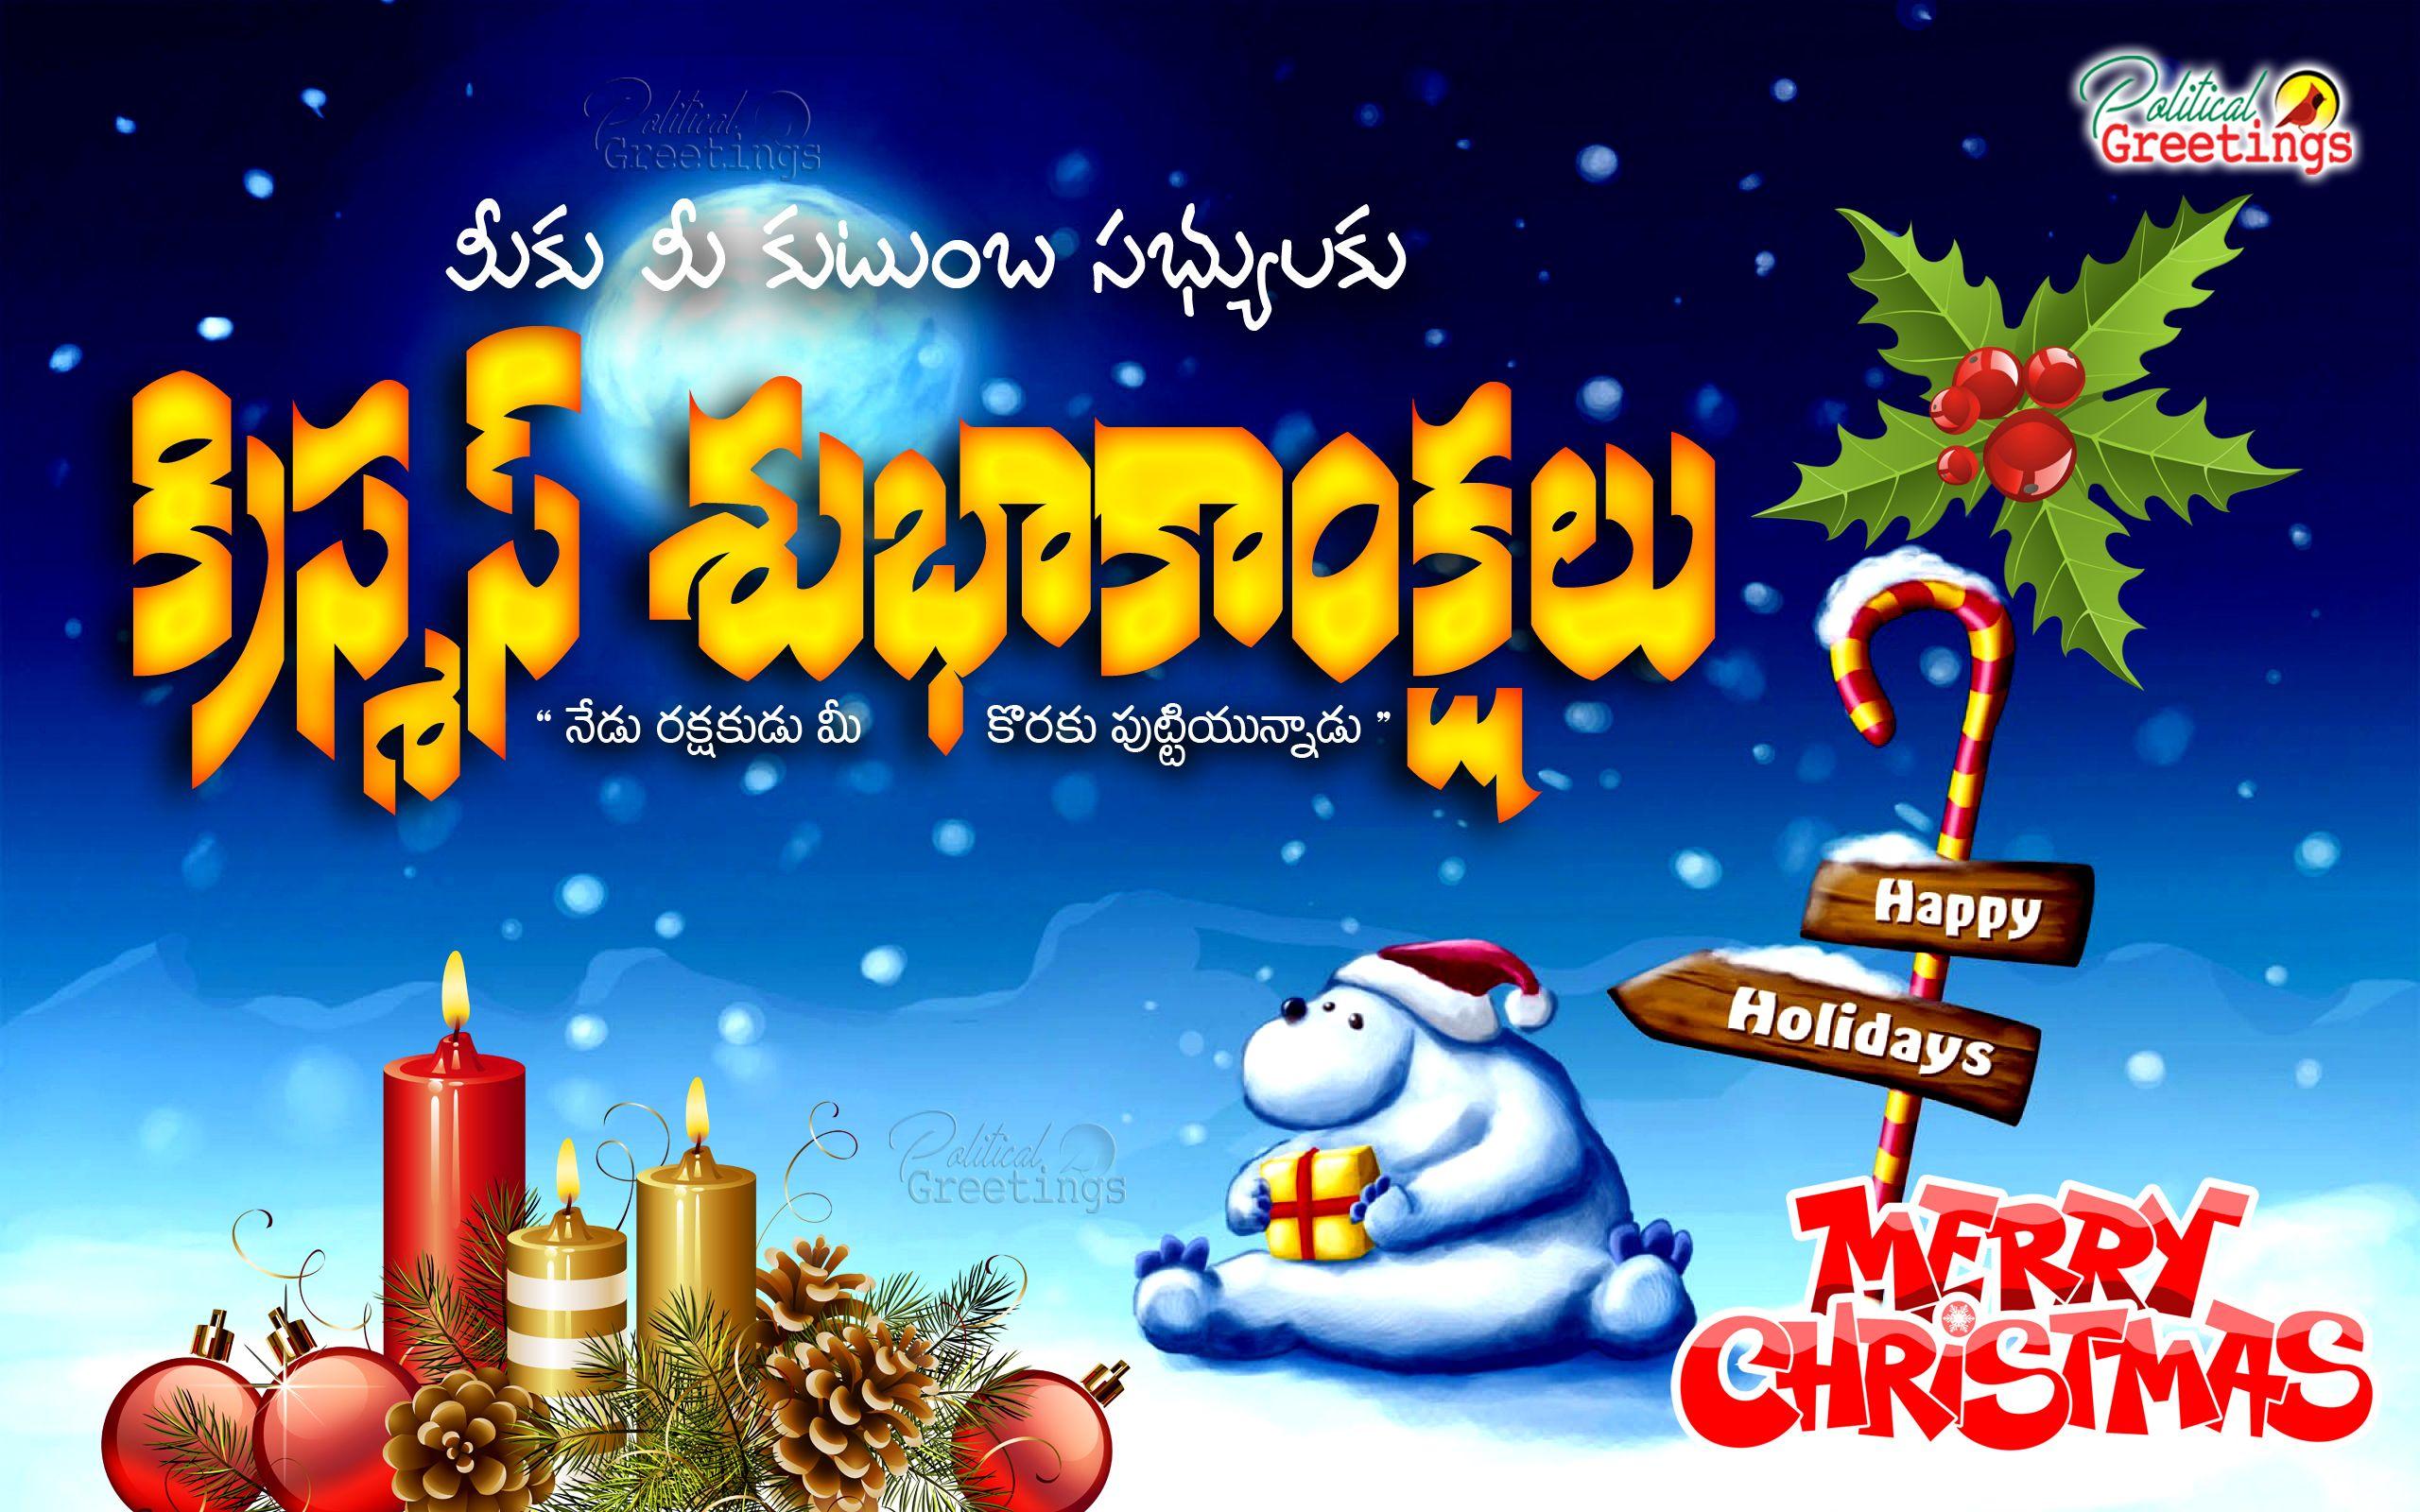 Telugu Christmas Online Free greetings, Free Telugu